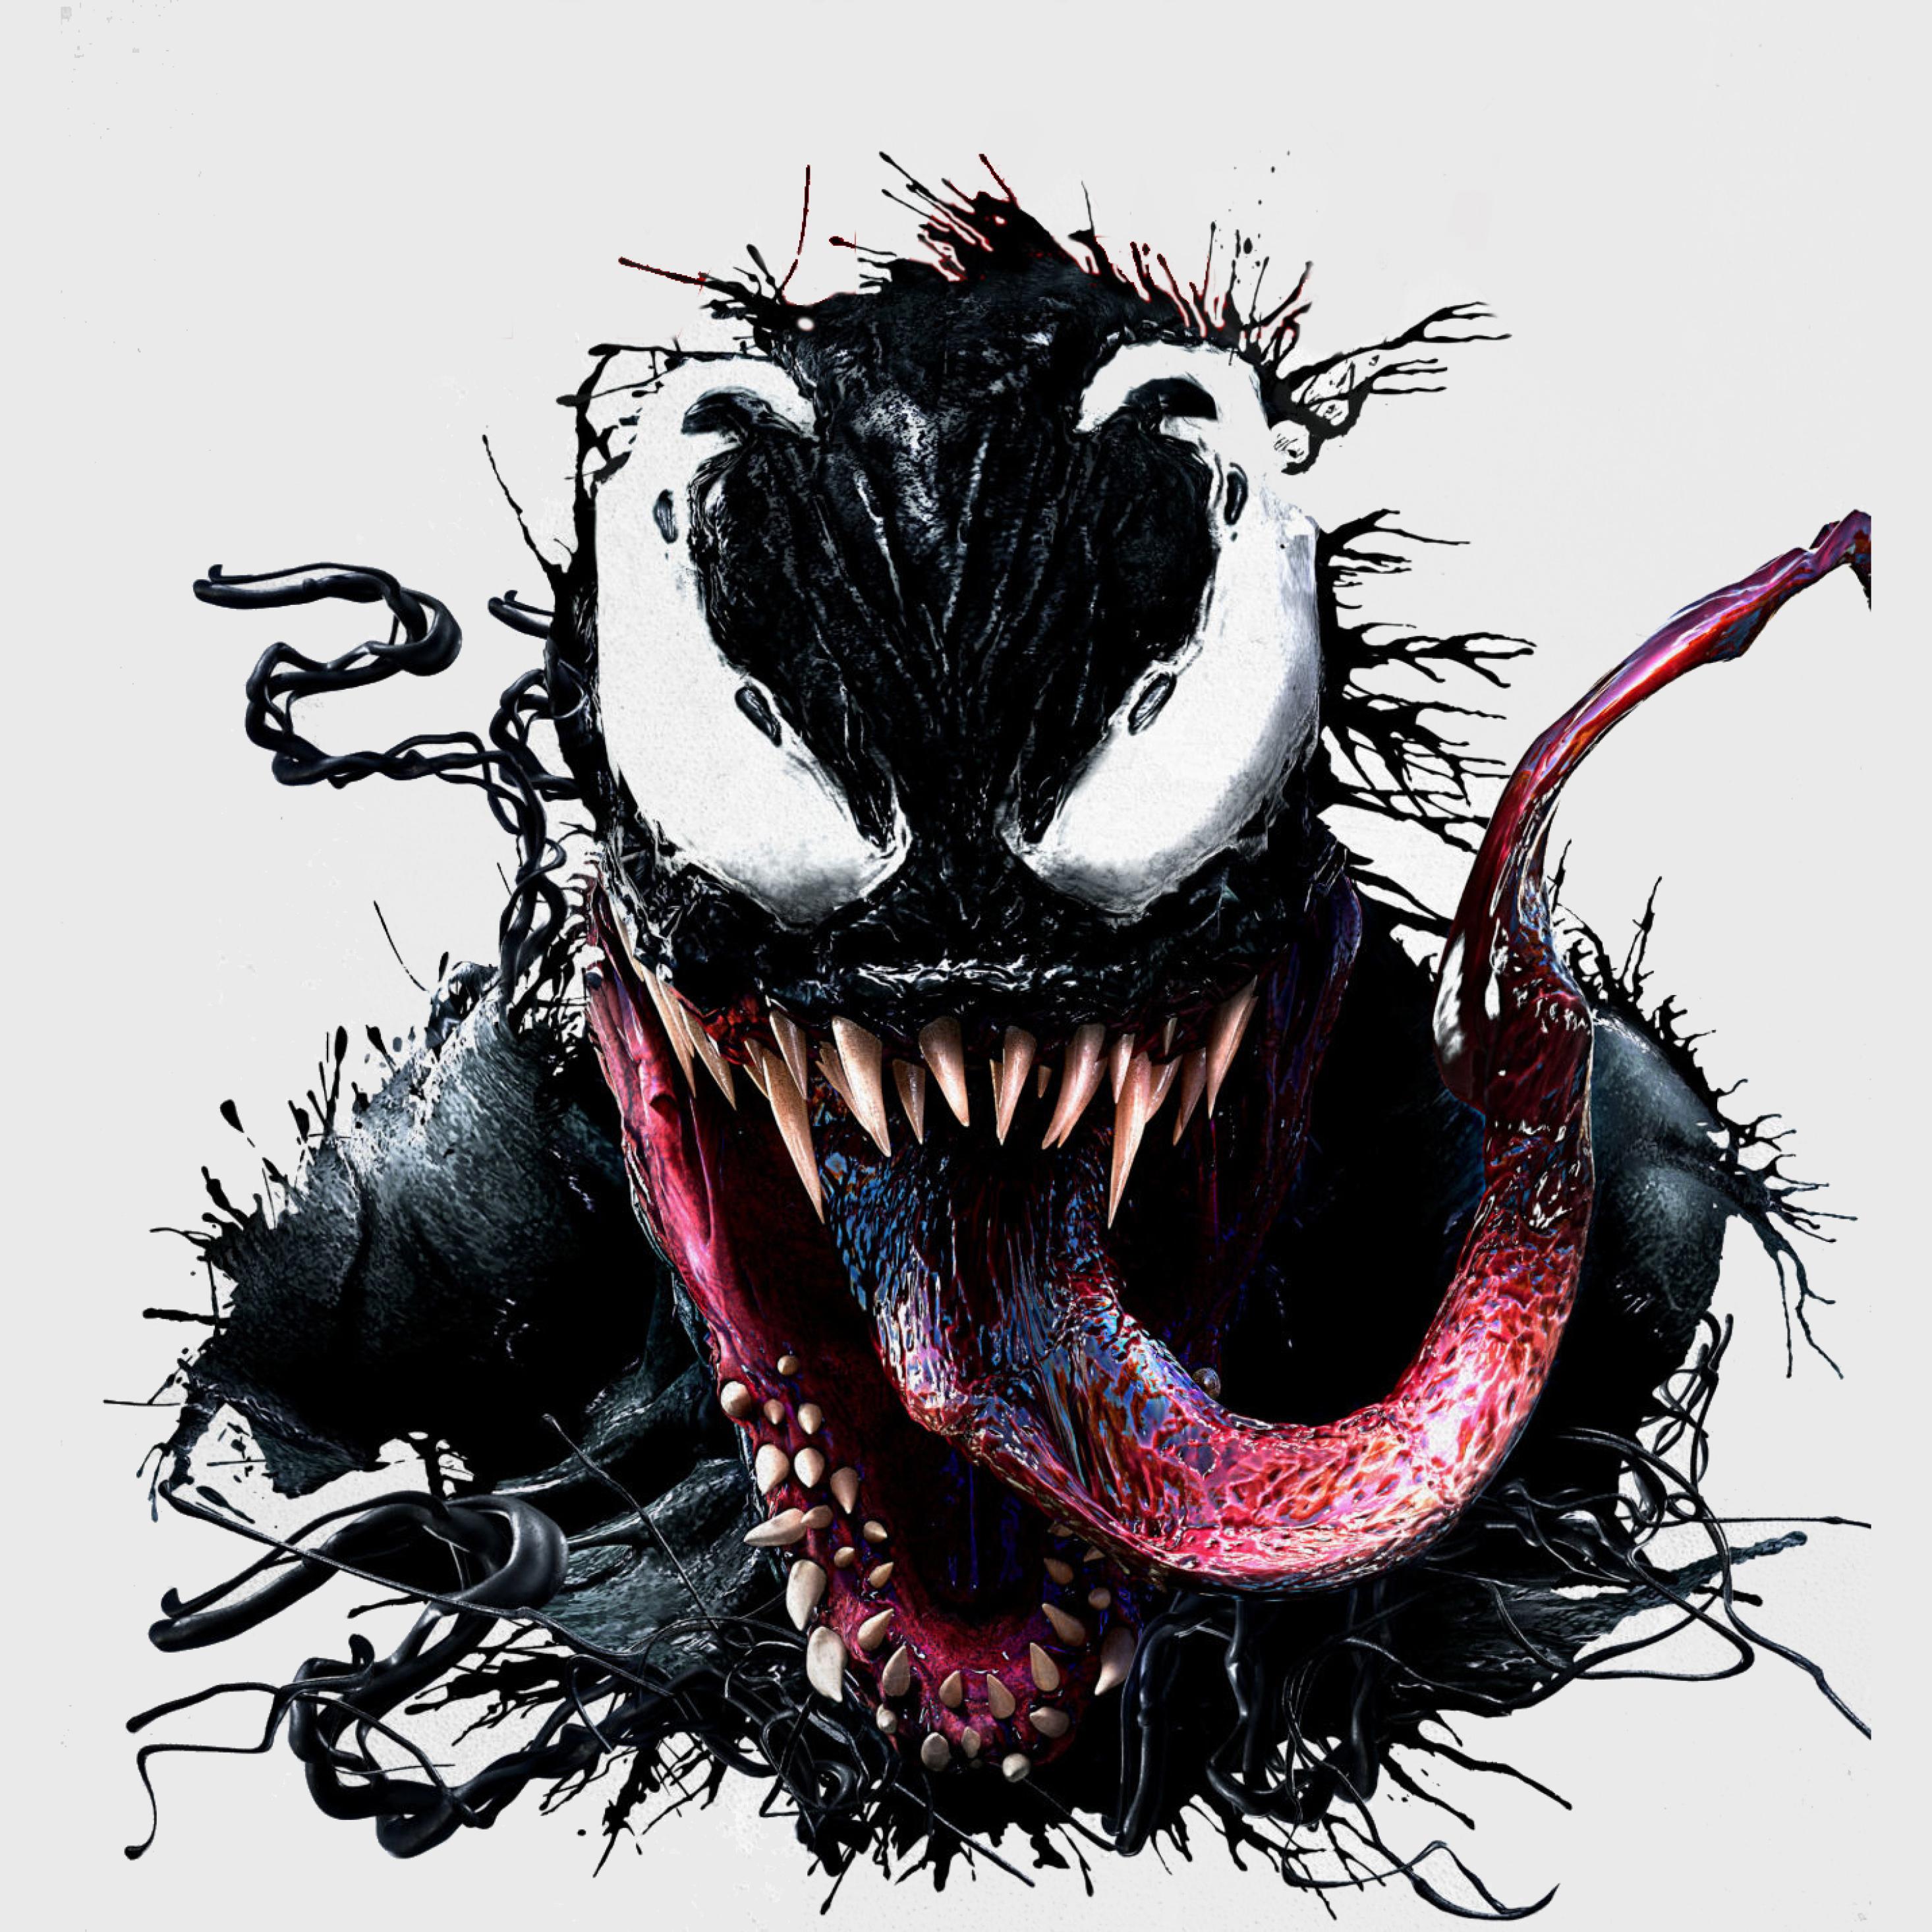 2932x2932 Venom 2018 Movie IMAX Poster Ipad Pro Retina ...